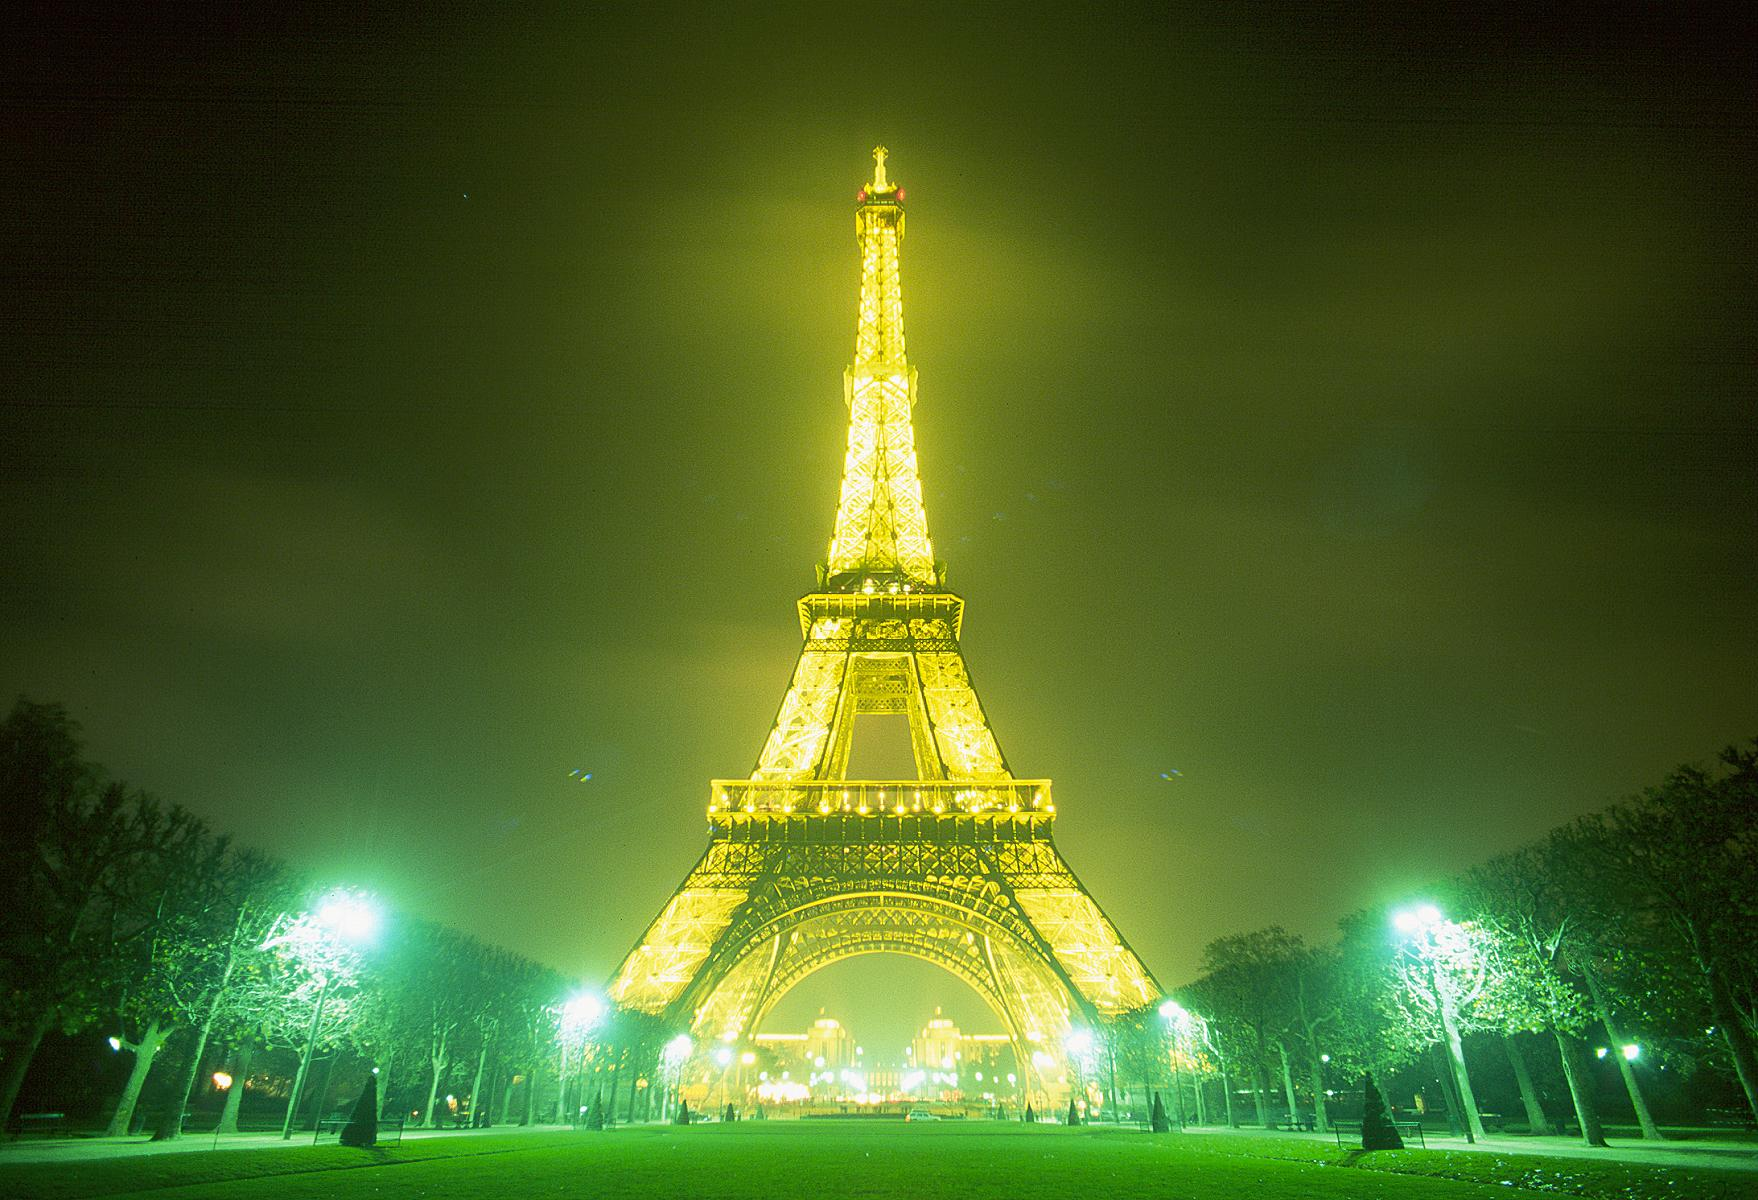 Eiffel tower night wallpaper